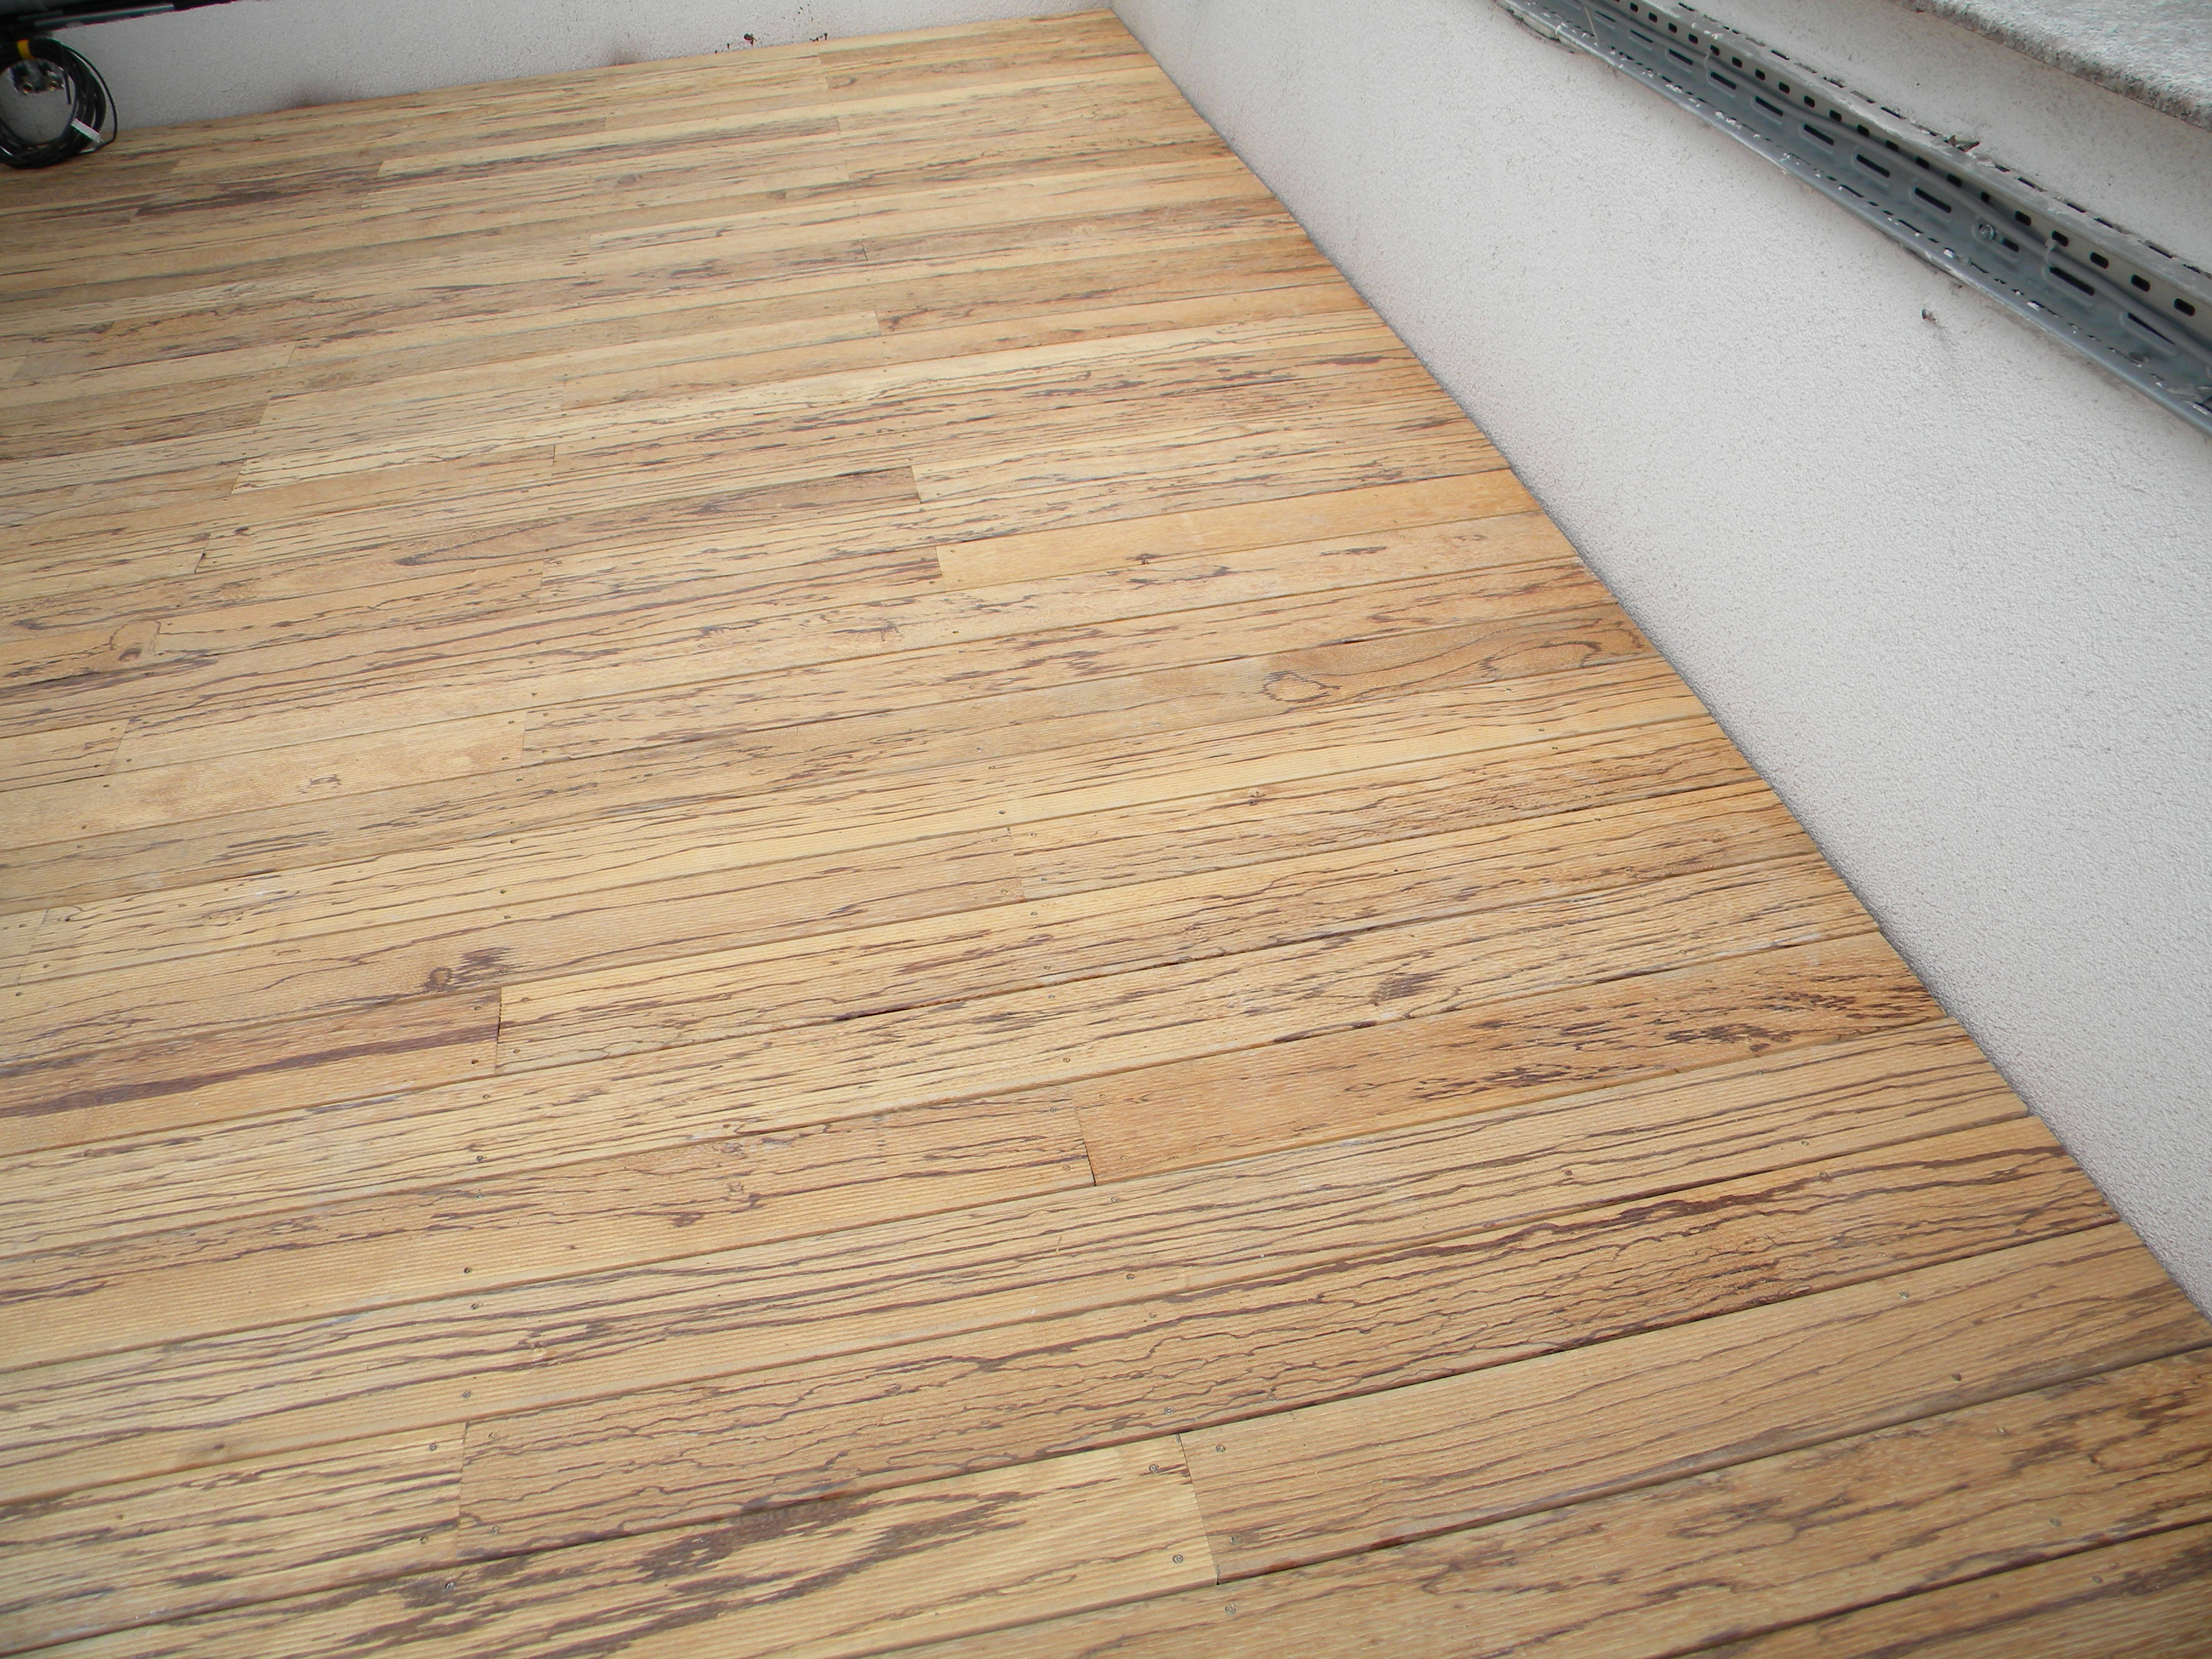 Deck-uri lemn - Angelim Rajado SELVA FLOORS - Poza 26